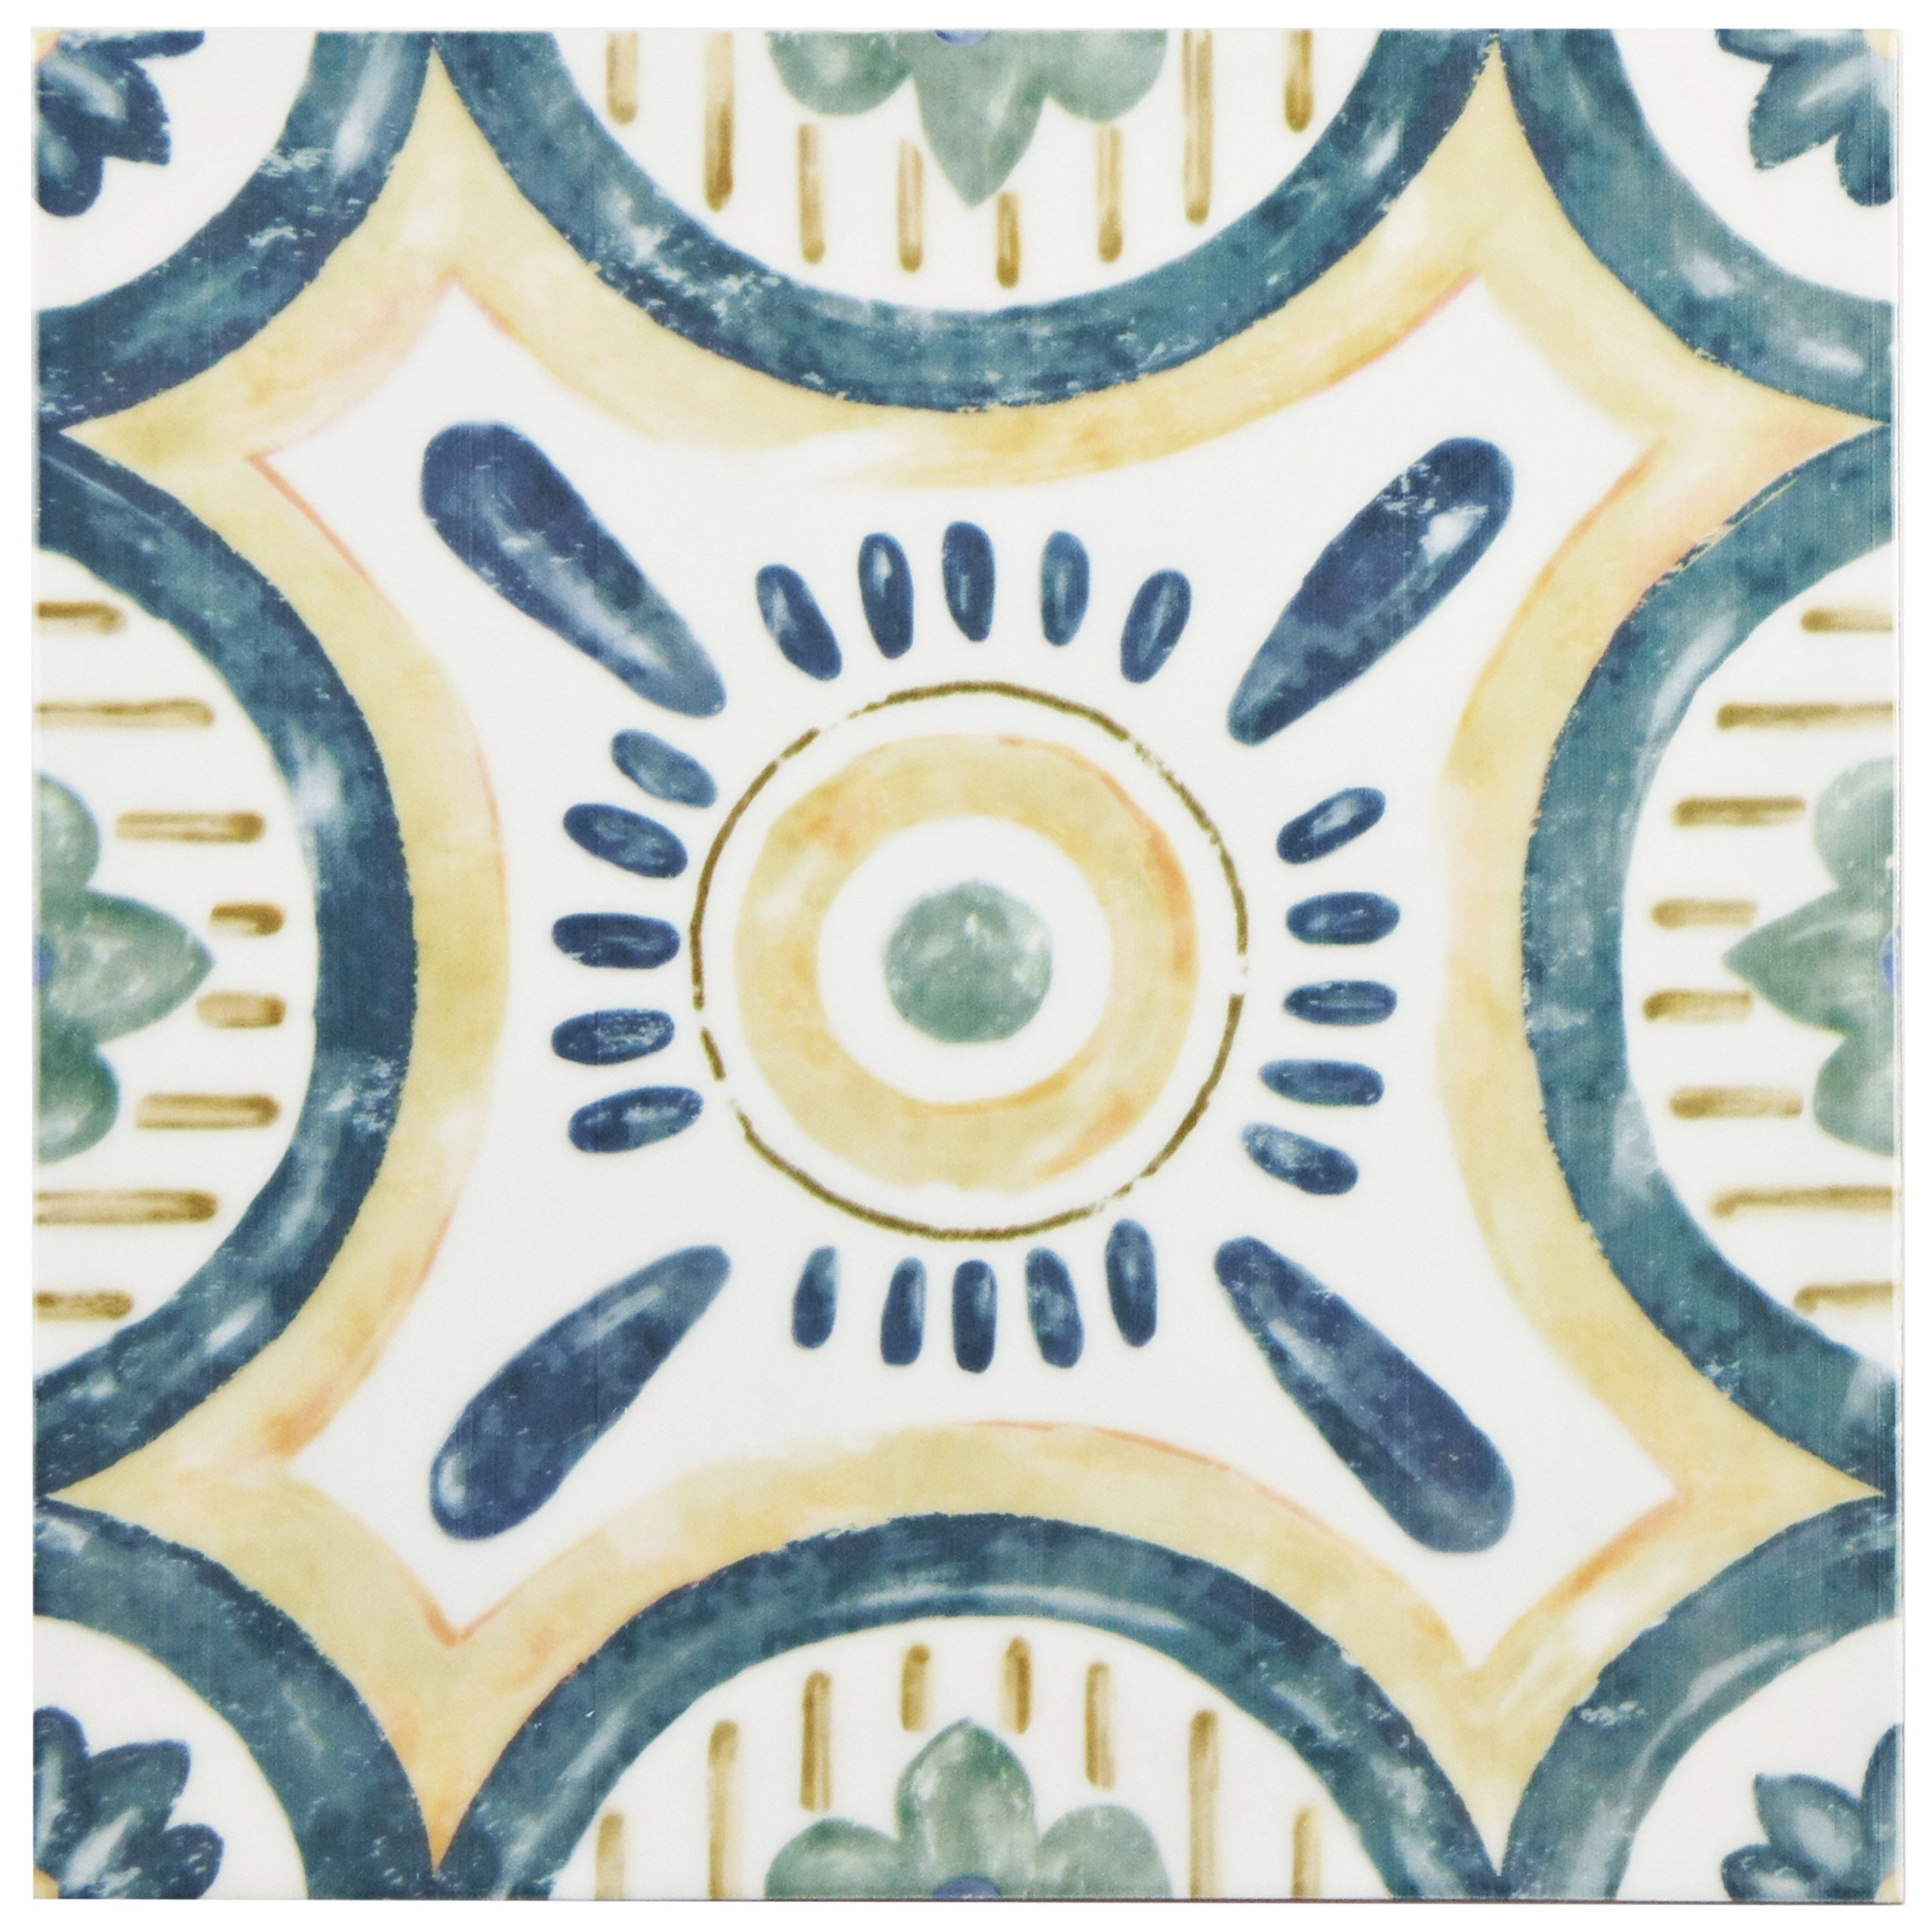 SomerTile 7.875'' x 7.875'', White/Green/Blue/Yellow WAEBOUIS Loire Ceramic Wall Tile, 7.75'' x 7.75'', Isola